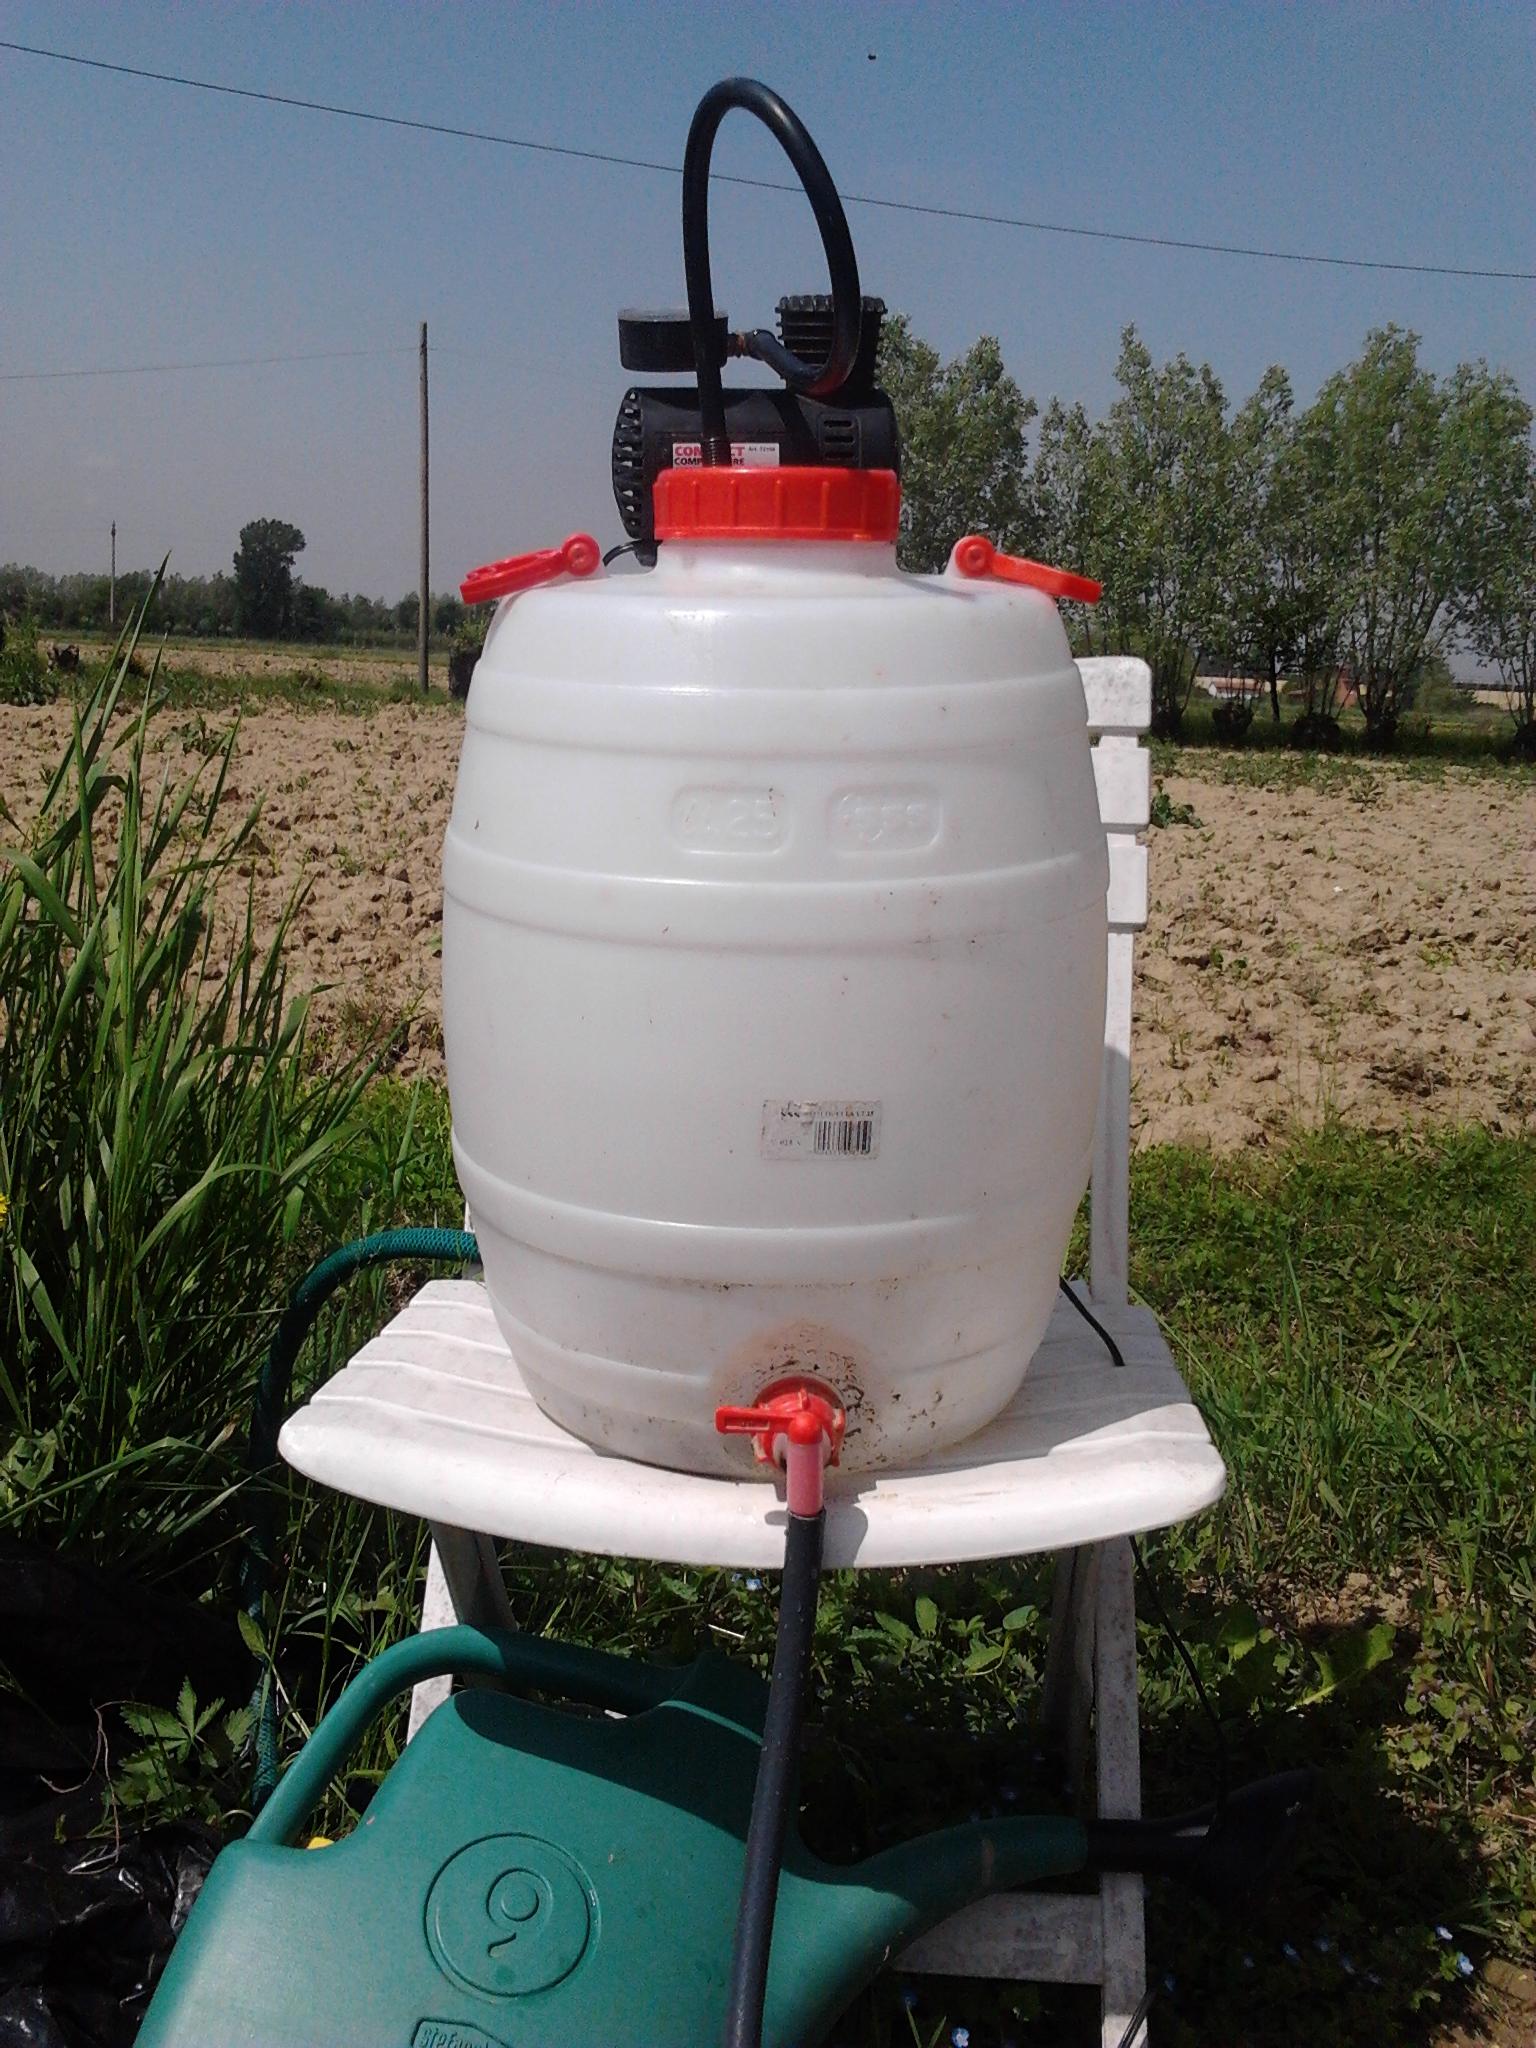 Simple garden sprinkler with pressure booster home made.